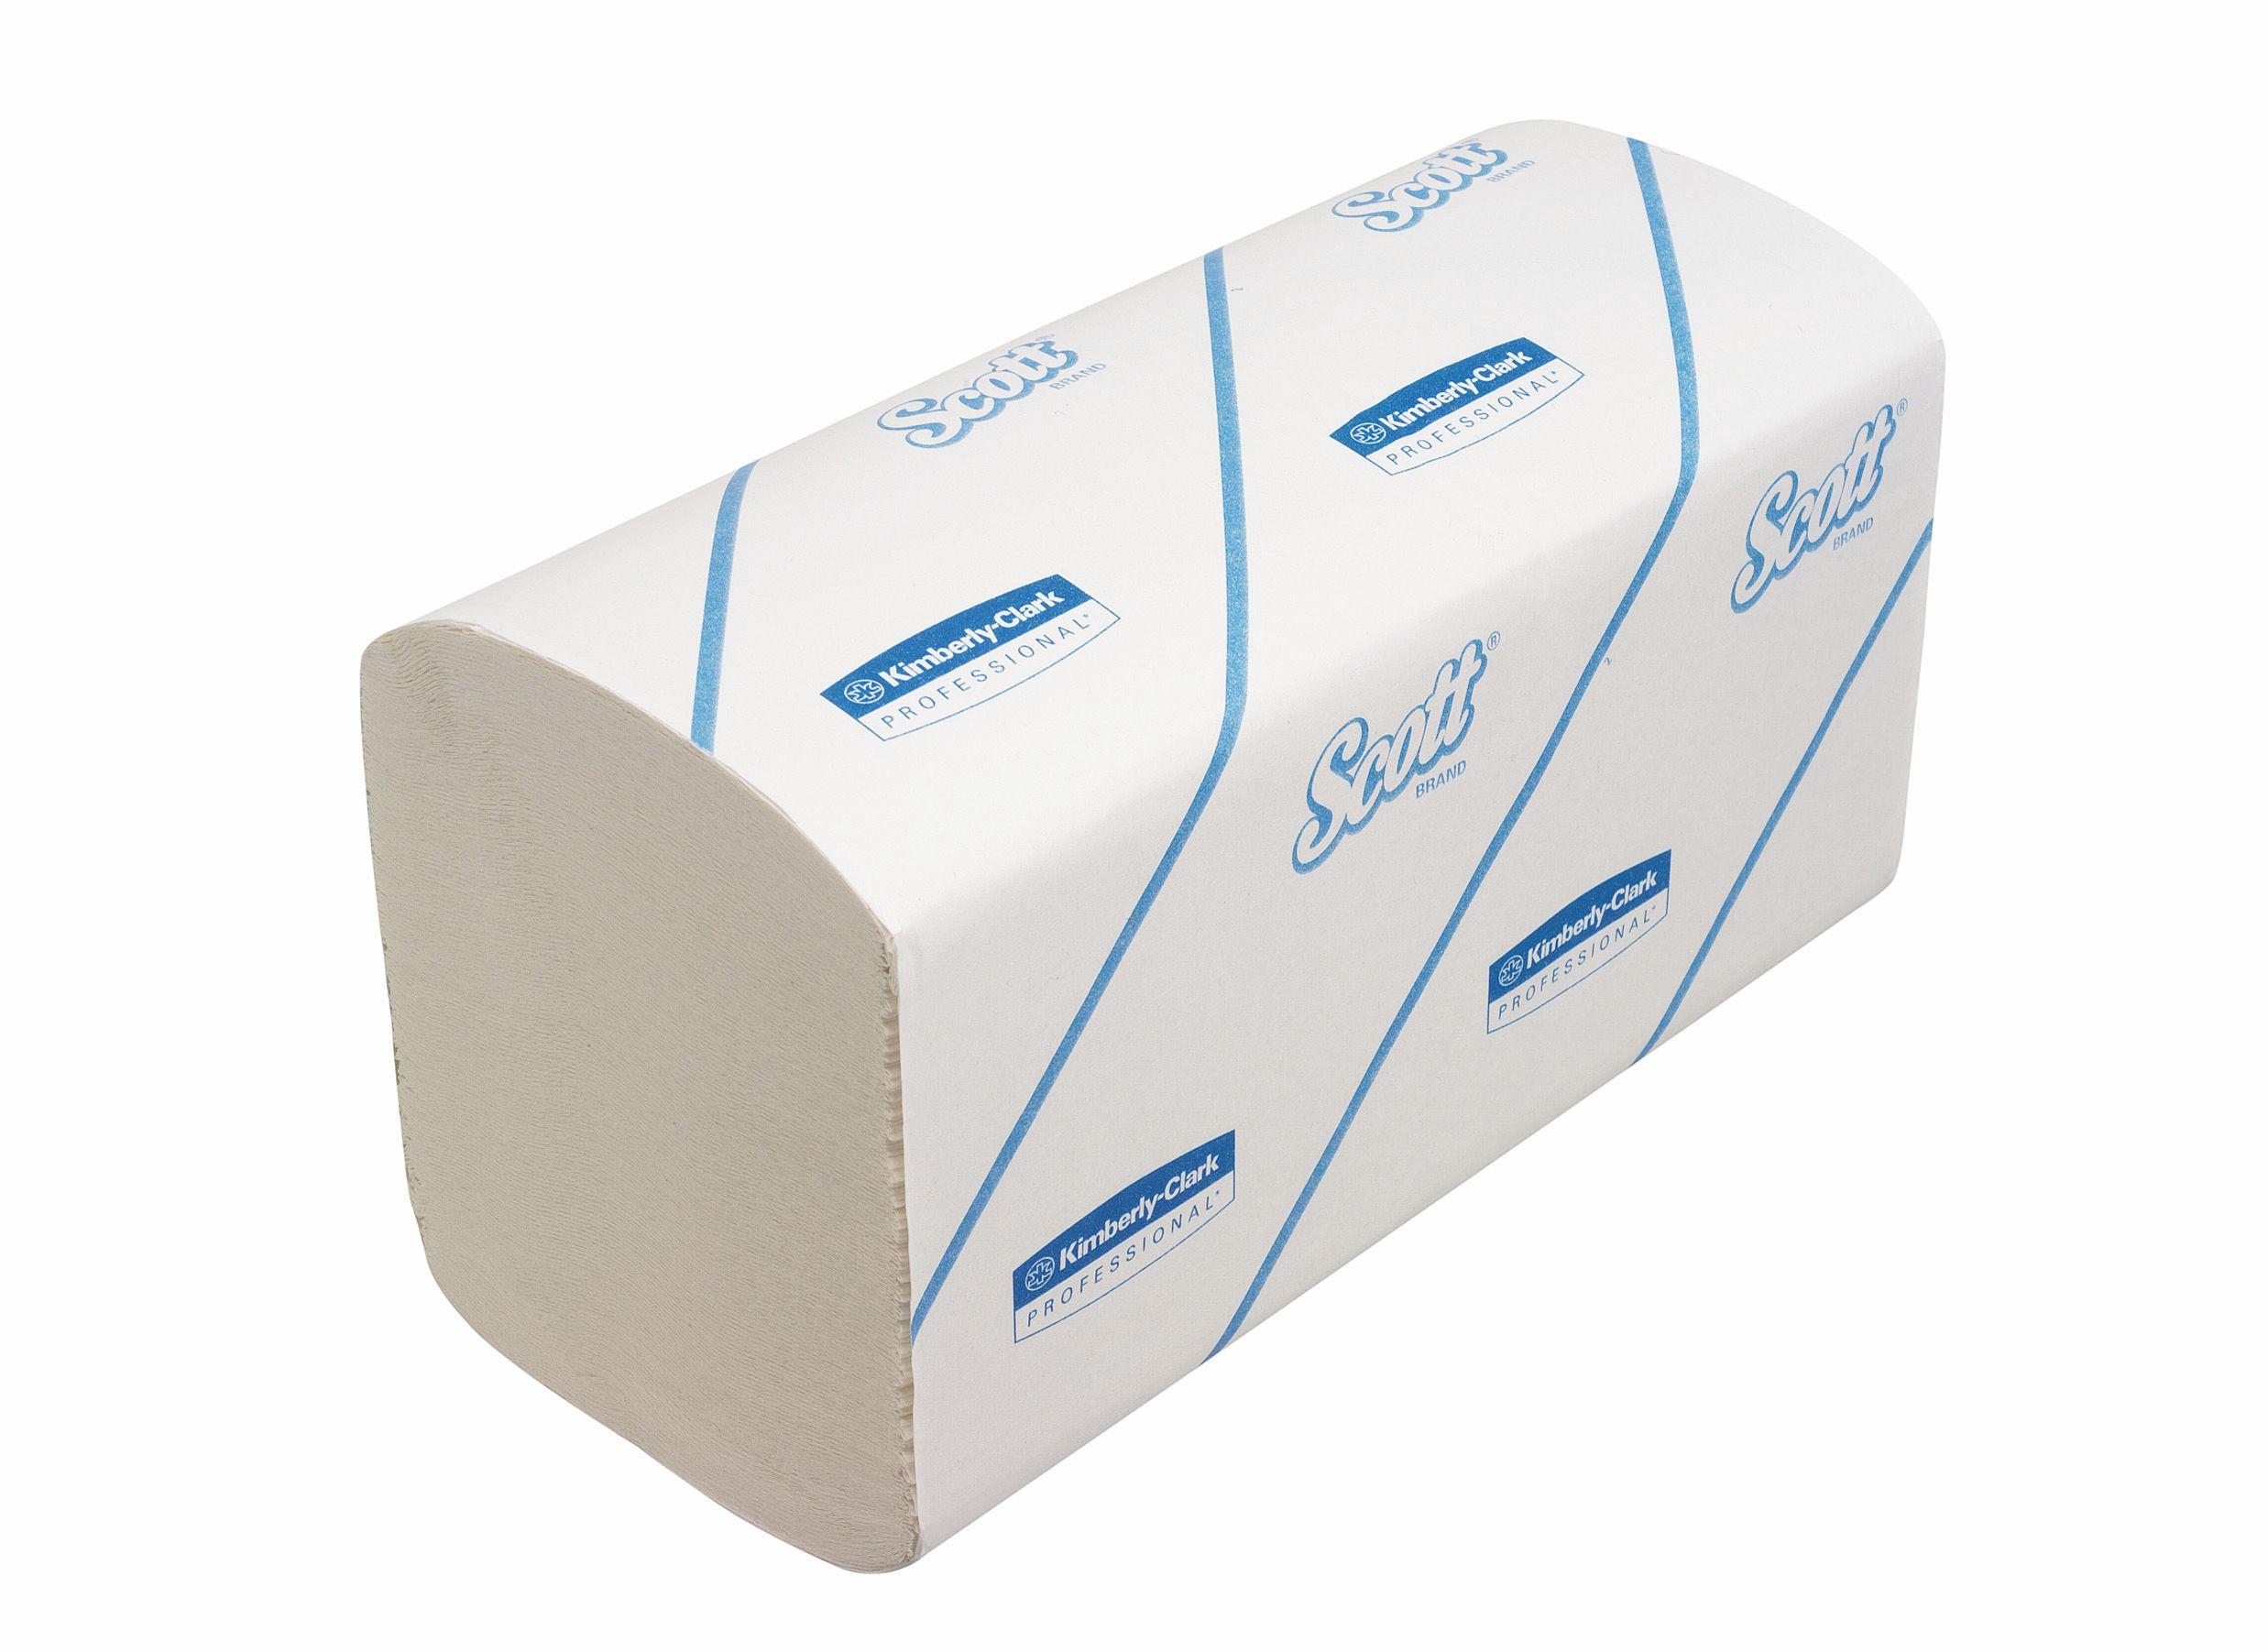 Scott White Sml Hand Towels Folded Pk15